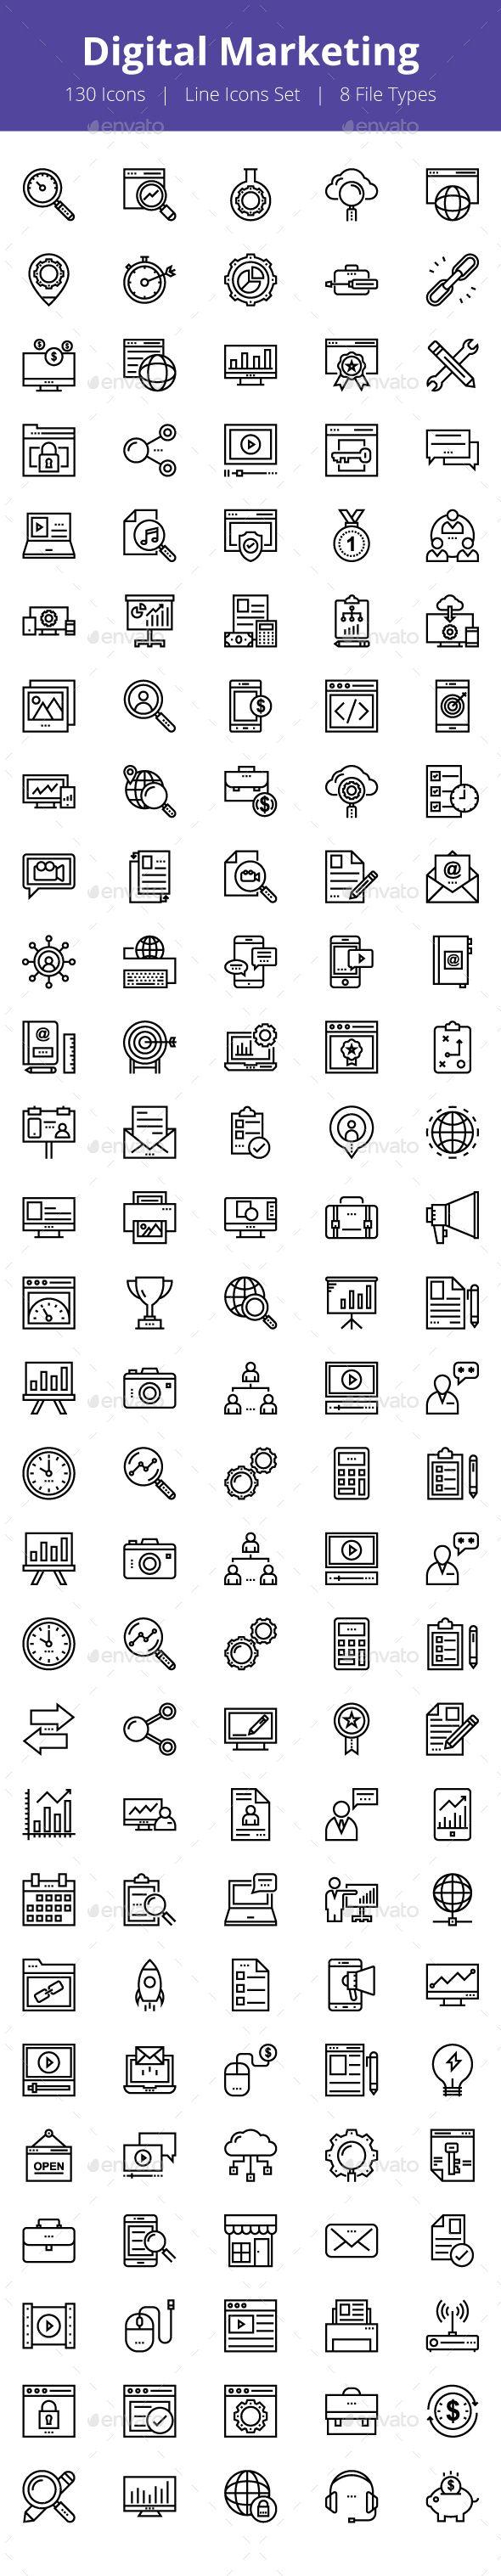 125+ Digital Marketing Line Icons